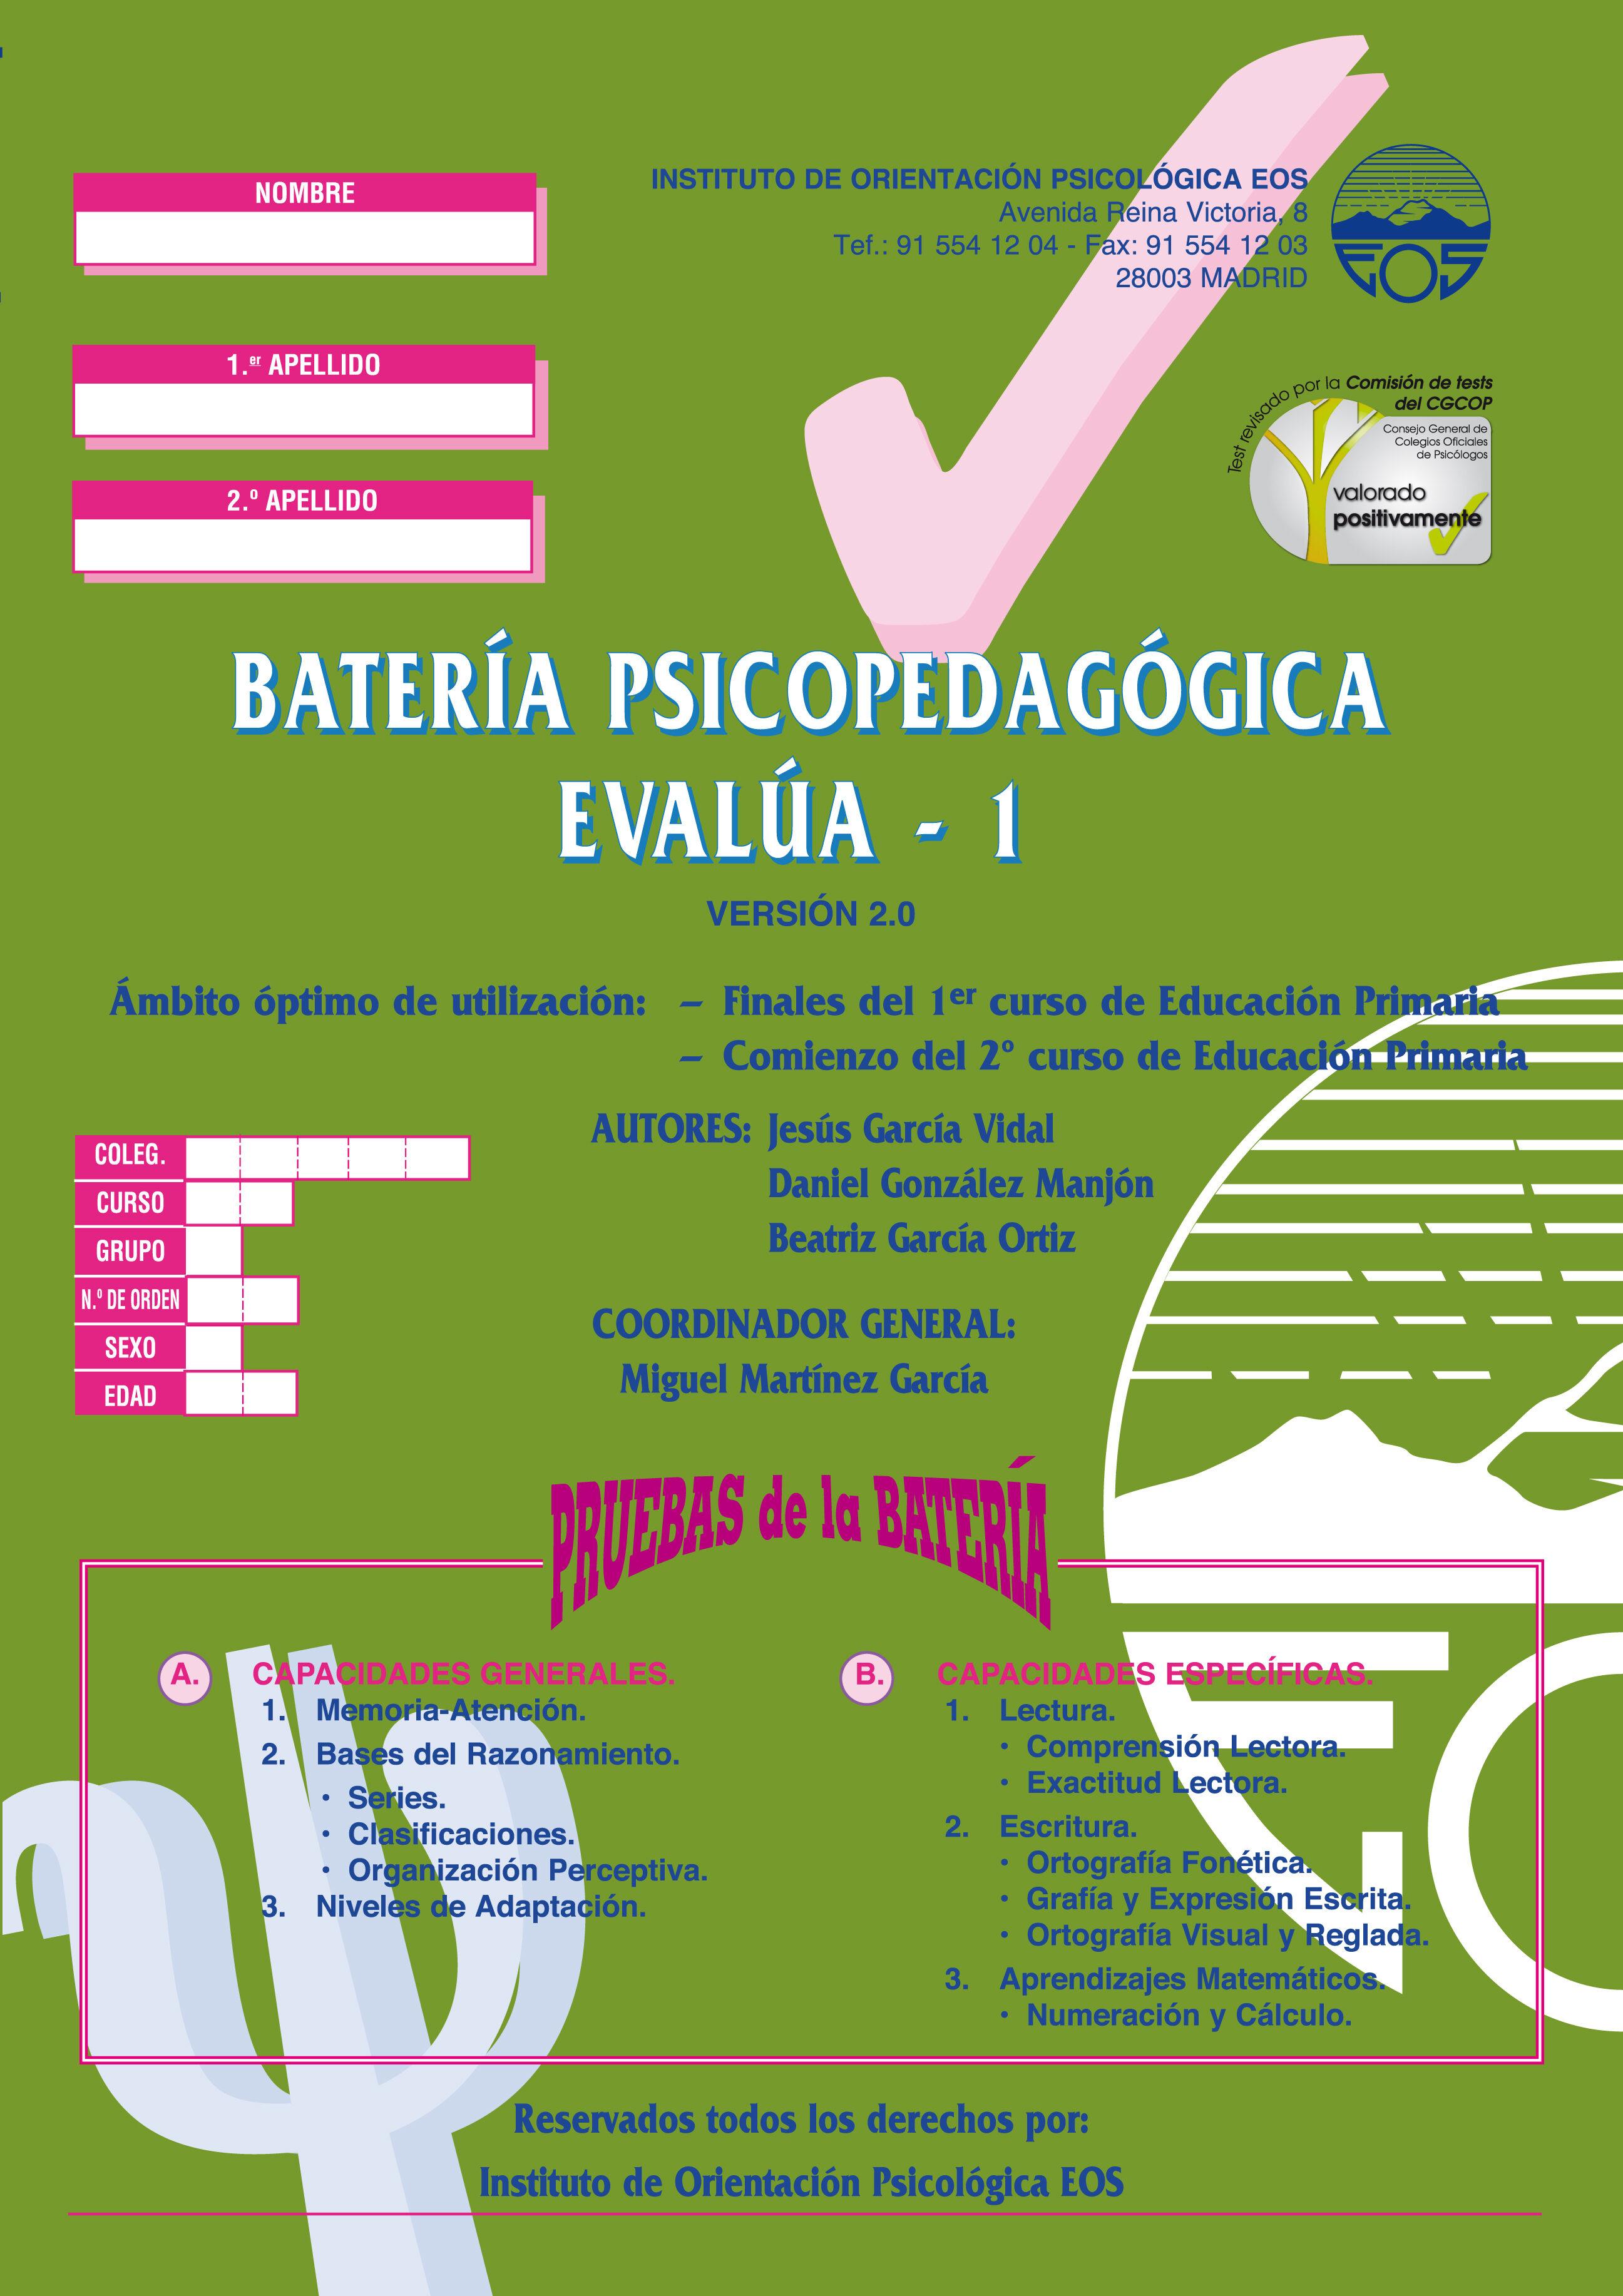 Bateria Psicopedagogica Evalua 1 por Jesus Et Al. Garcia Vidal epub